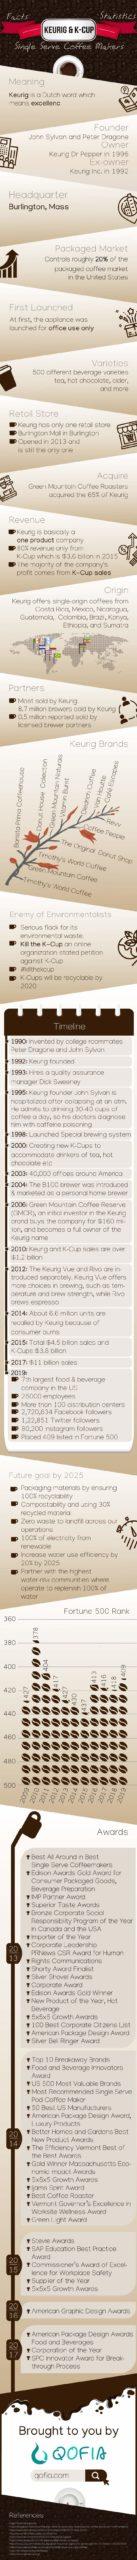 Facts-Statistics-of-Keurig-K-Cup